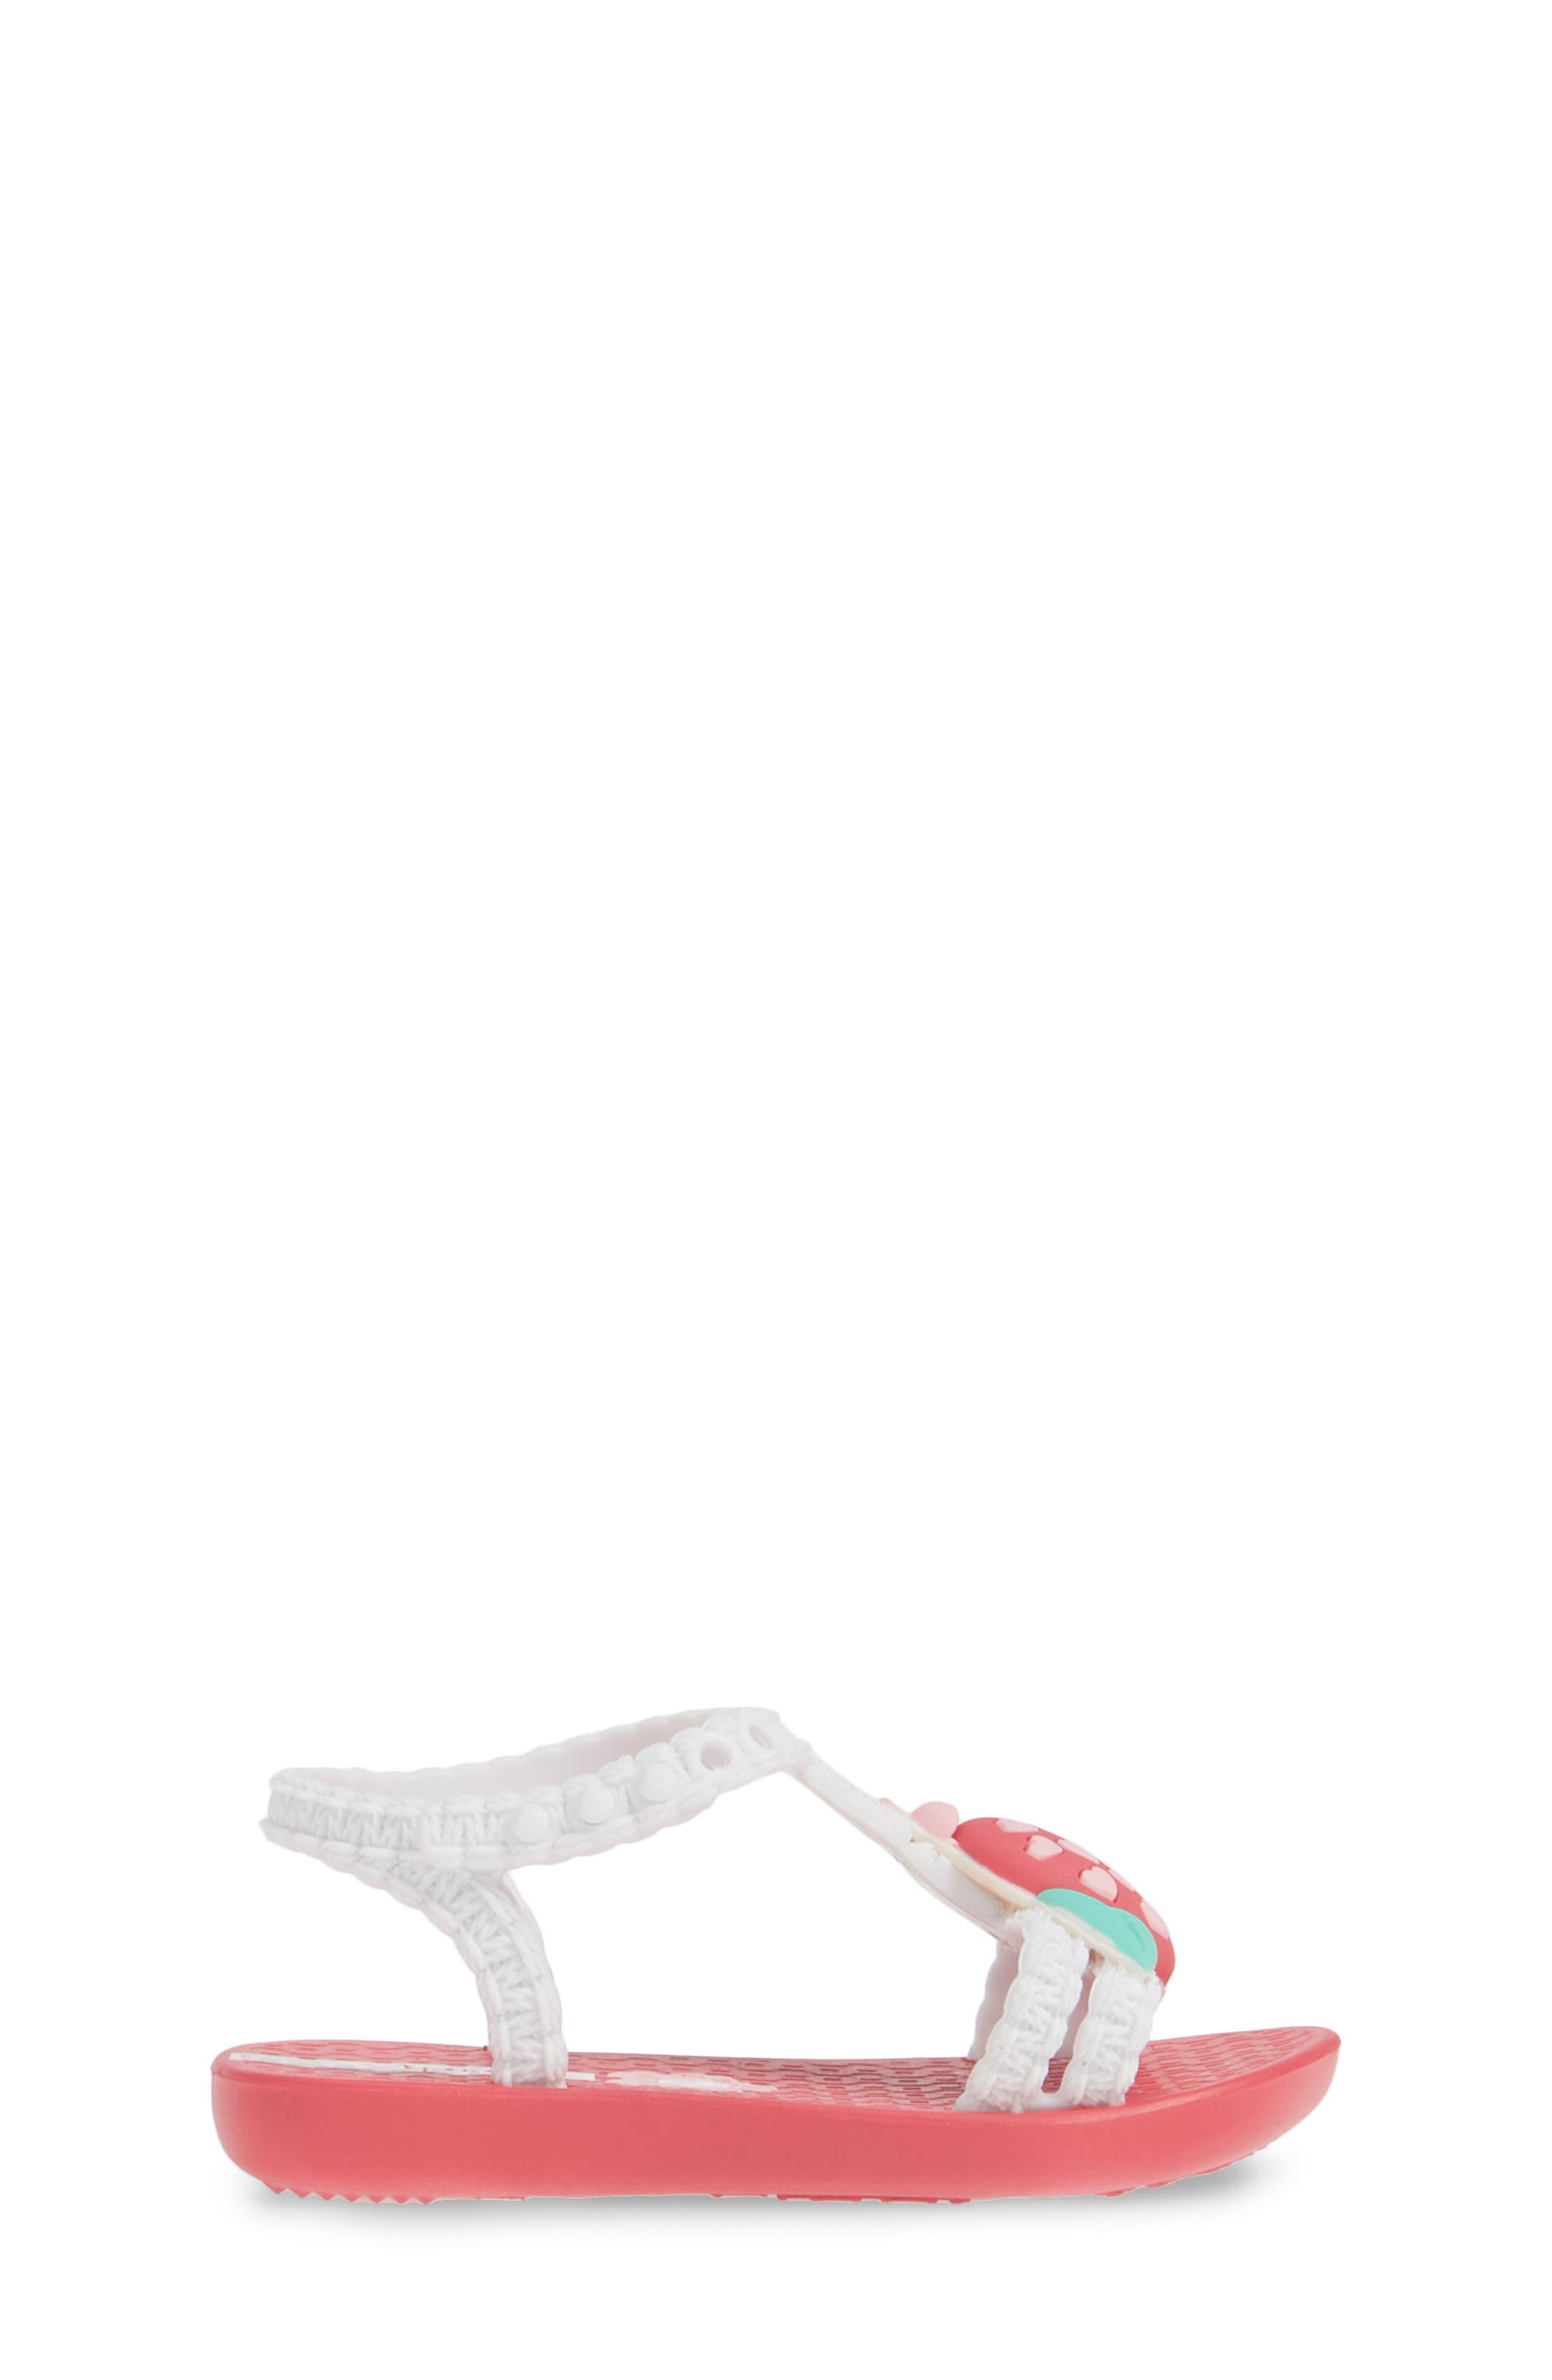 IPANEMA, Buggy Baby Sandal, Alternate thumbnail 3, color, PINK/ WHITE